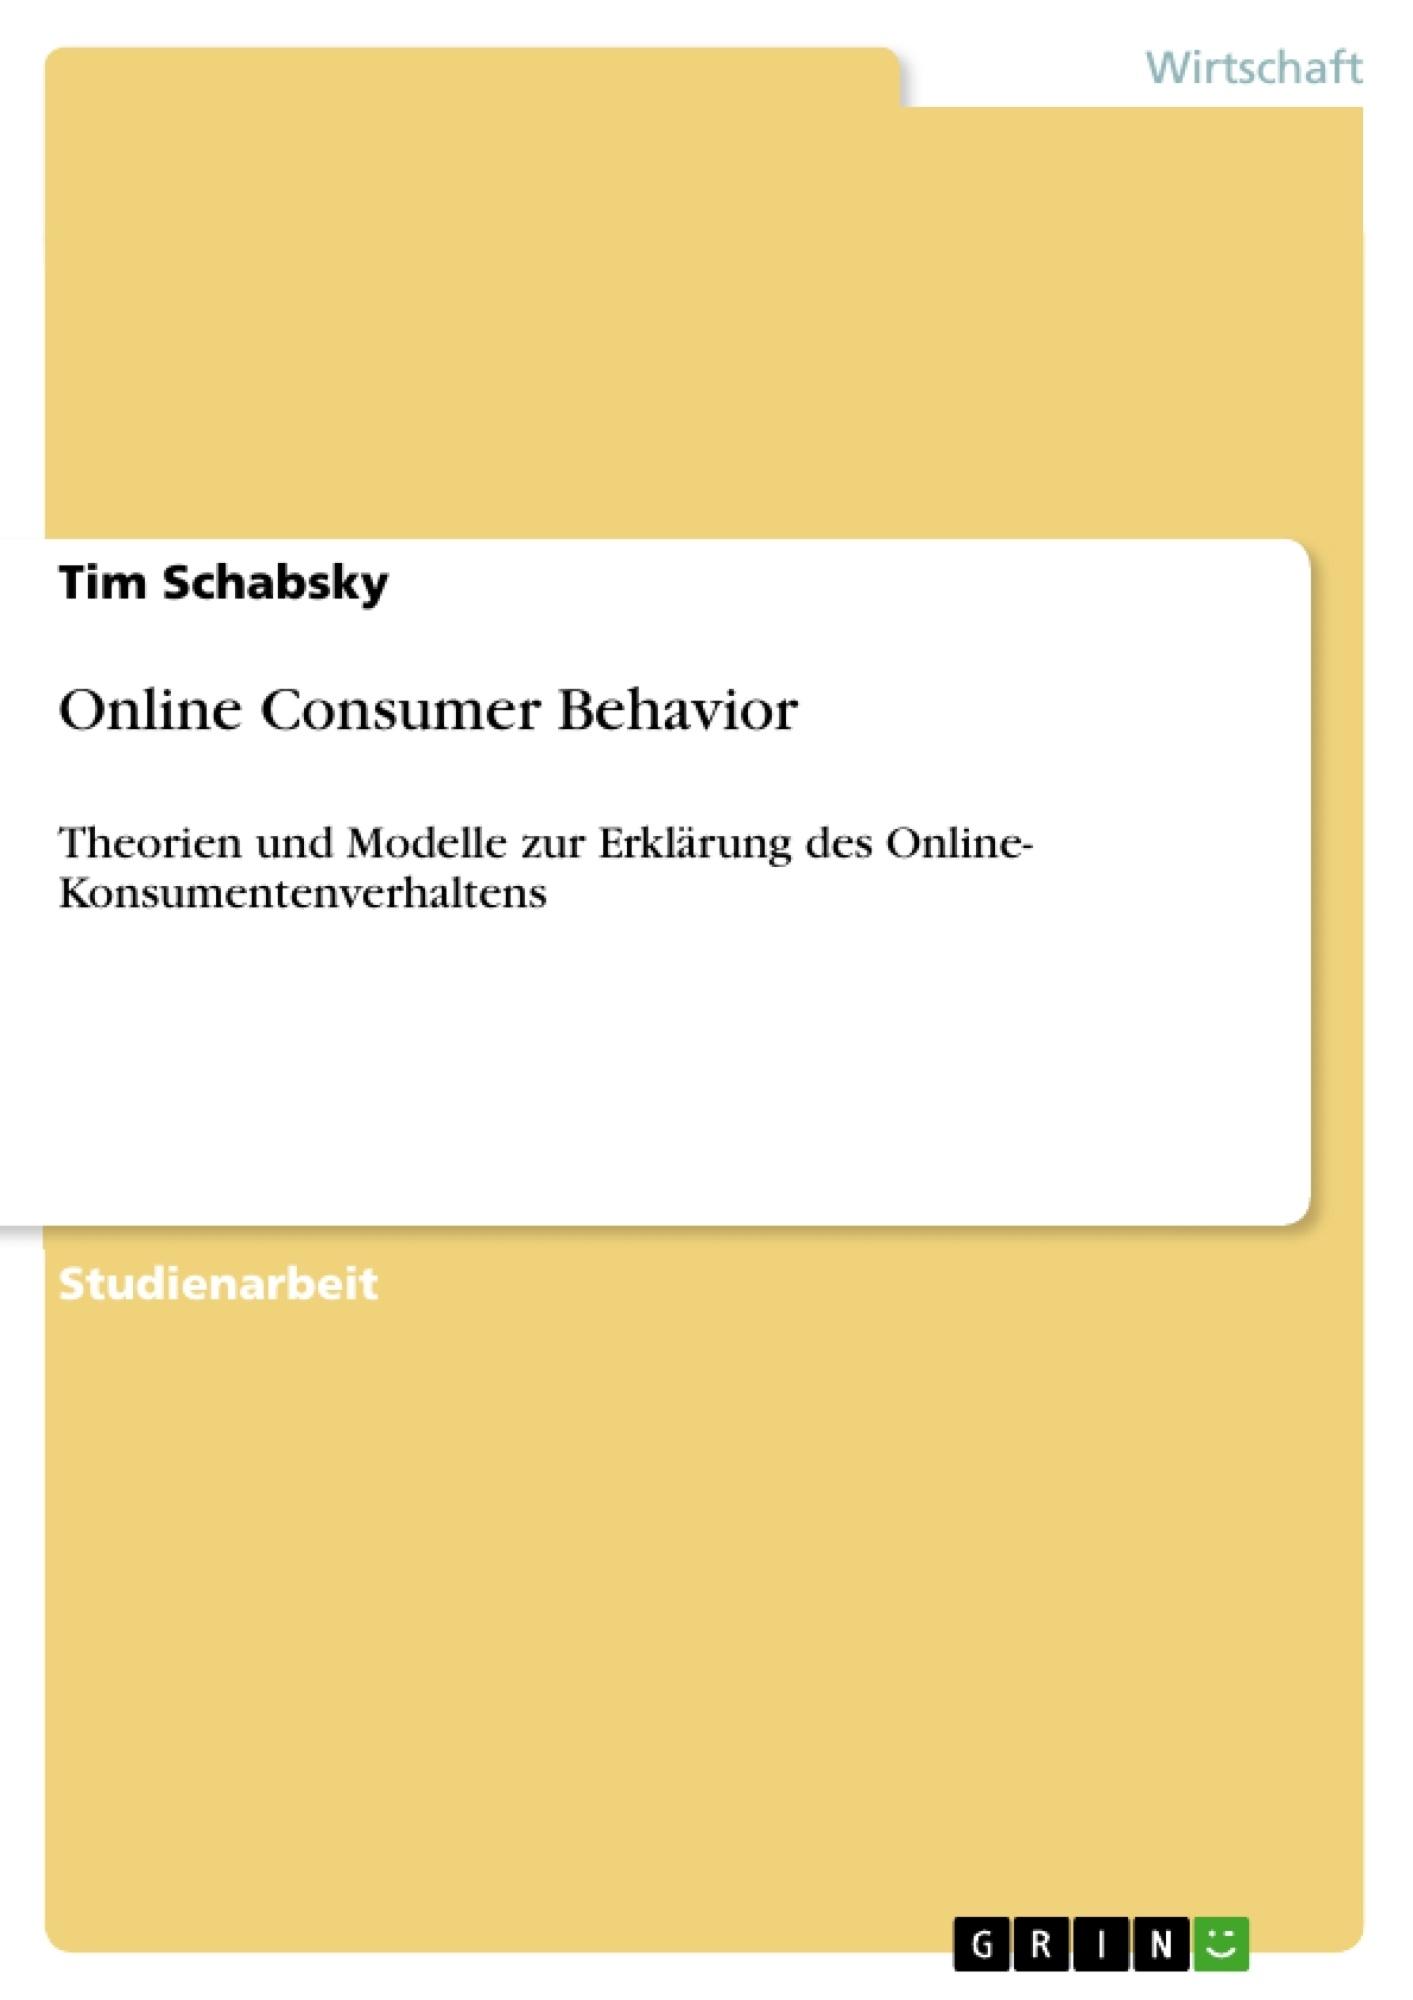 Titel: Online Consumer Behavior